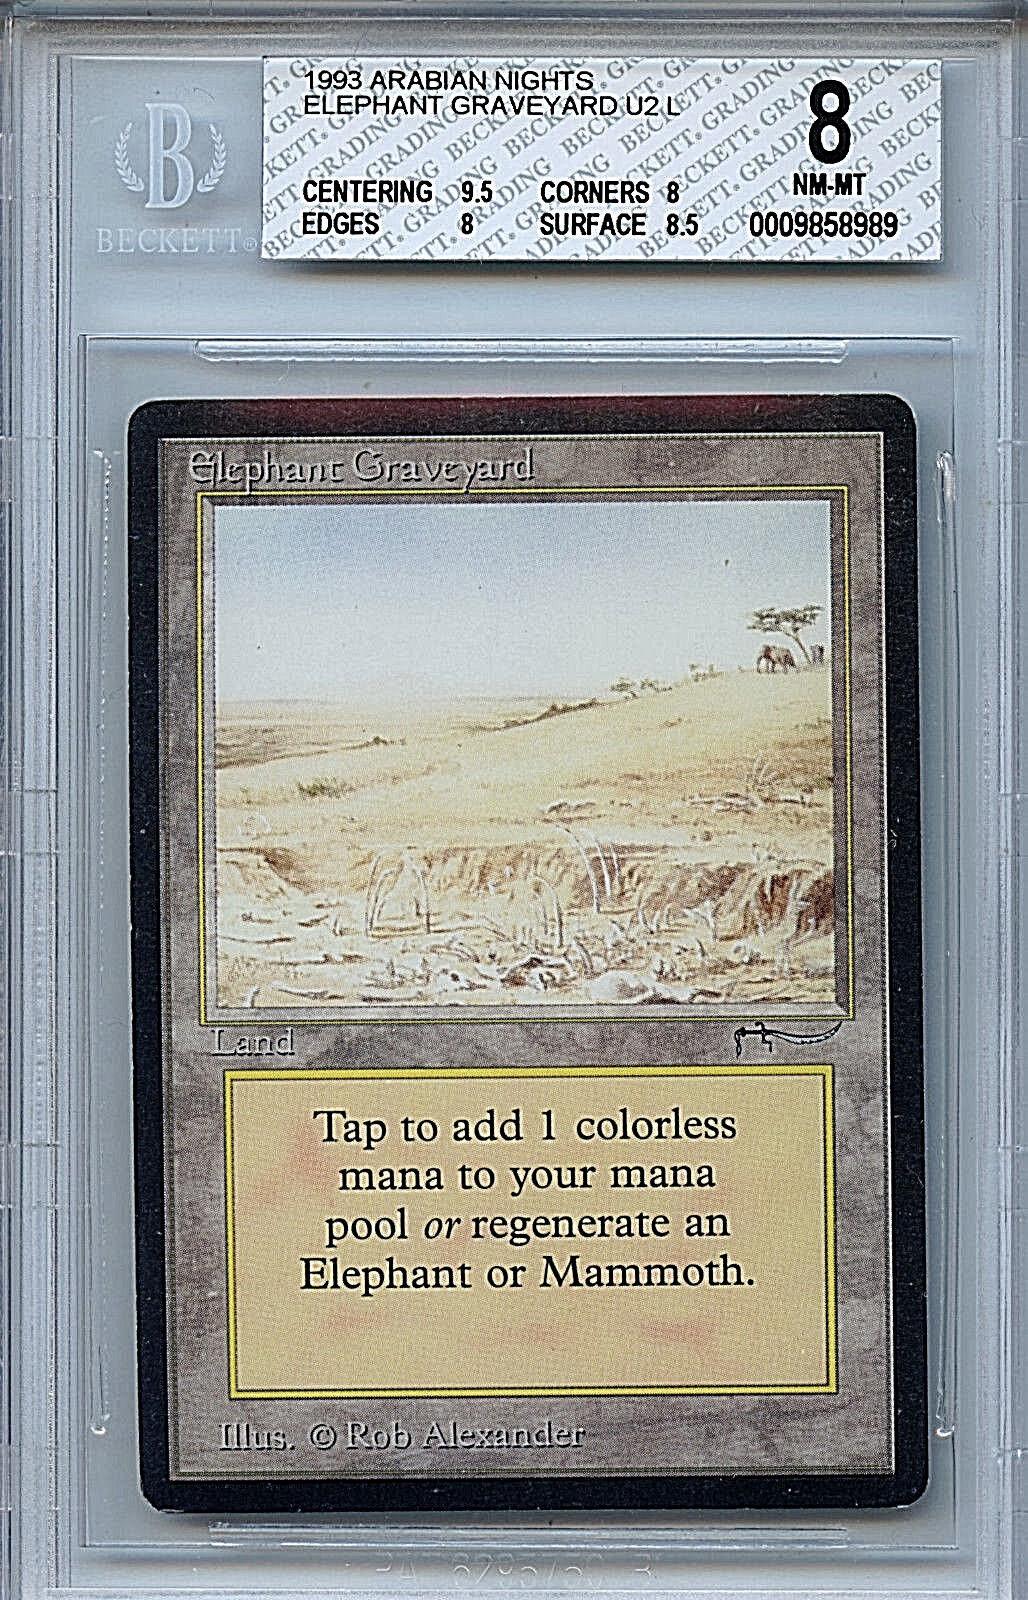 MTG Arabian Nights Elephant Graveyard BGS 8.0 (8) NM MT Magic Card Anricons 8989